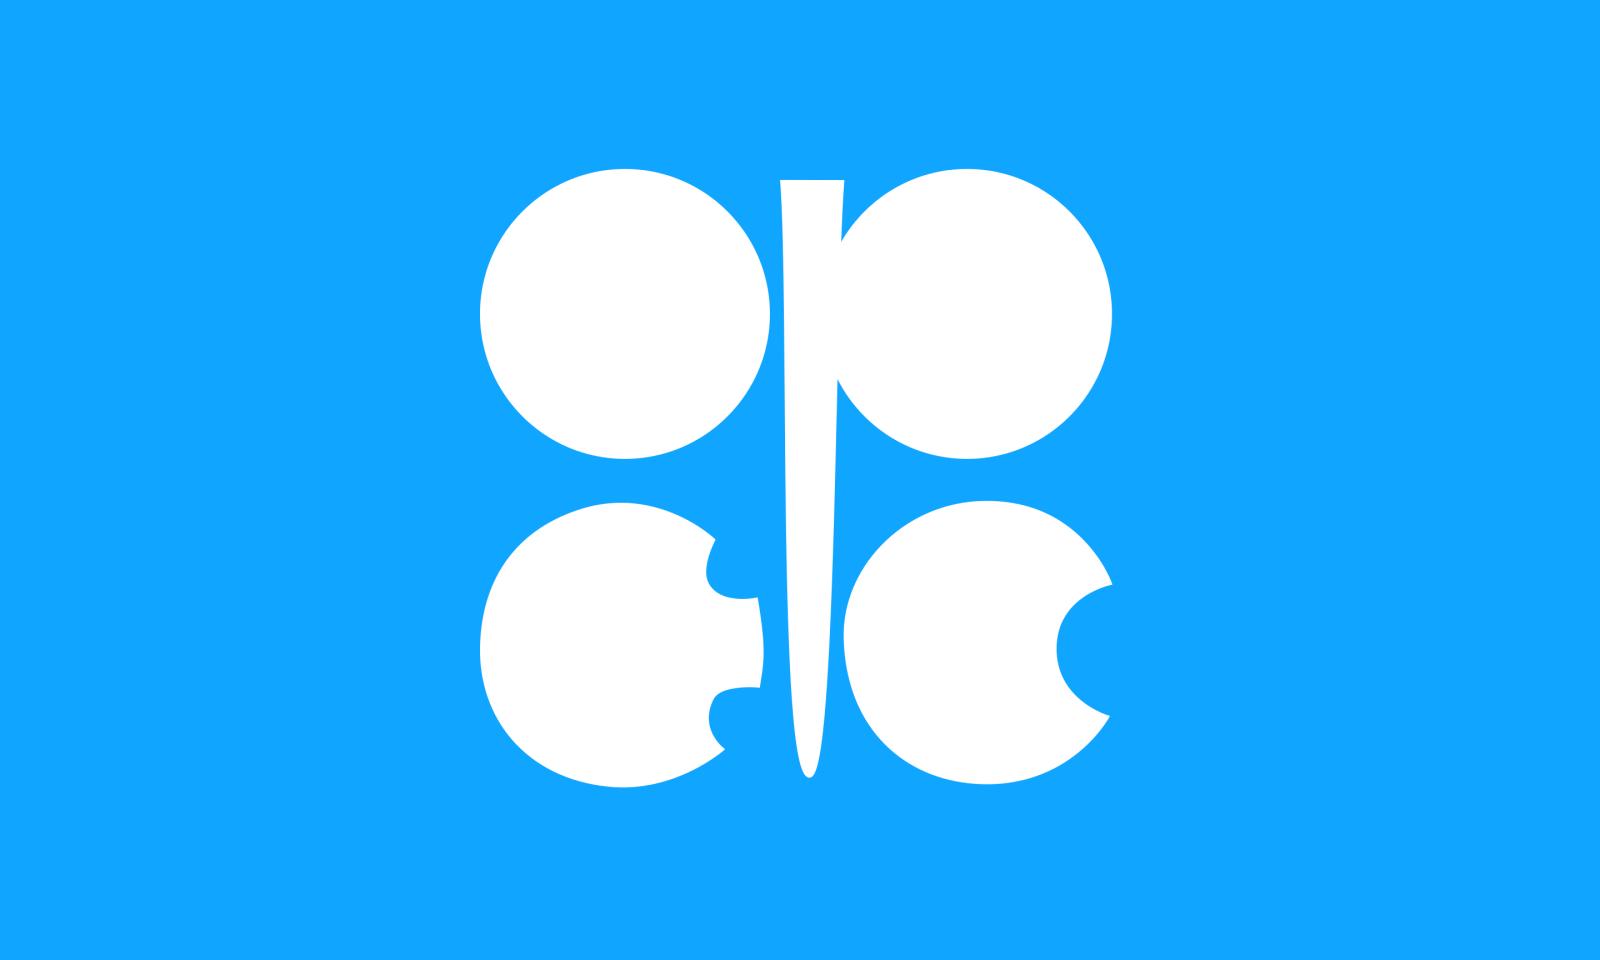 Das OPEC Logo